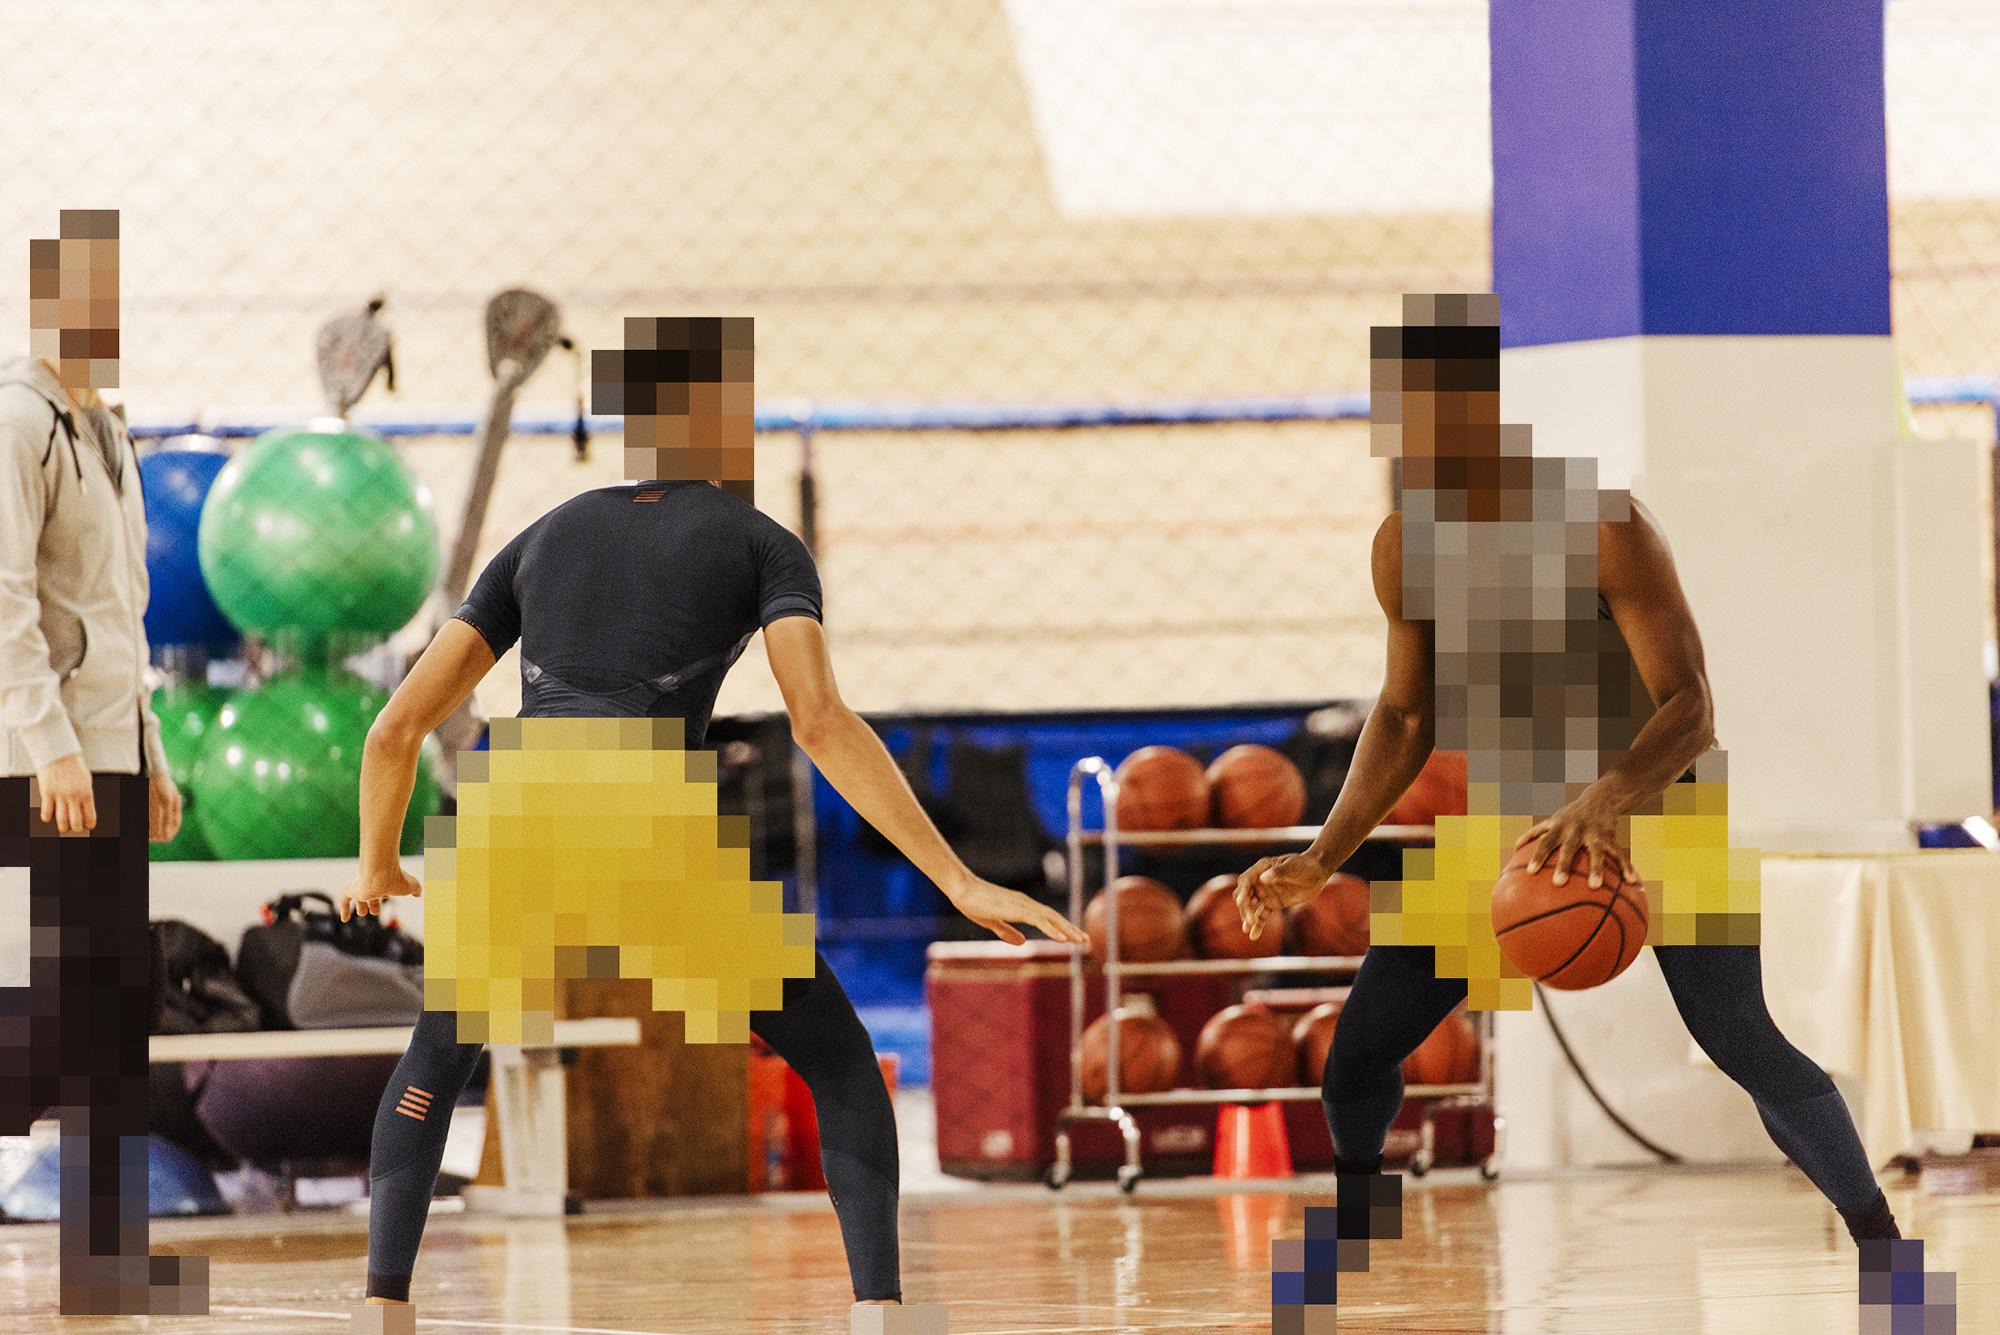 Canziani_Snapbac_Basketball_Nikon-2663_layered_rgb.jpg